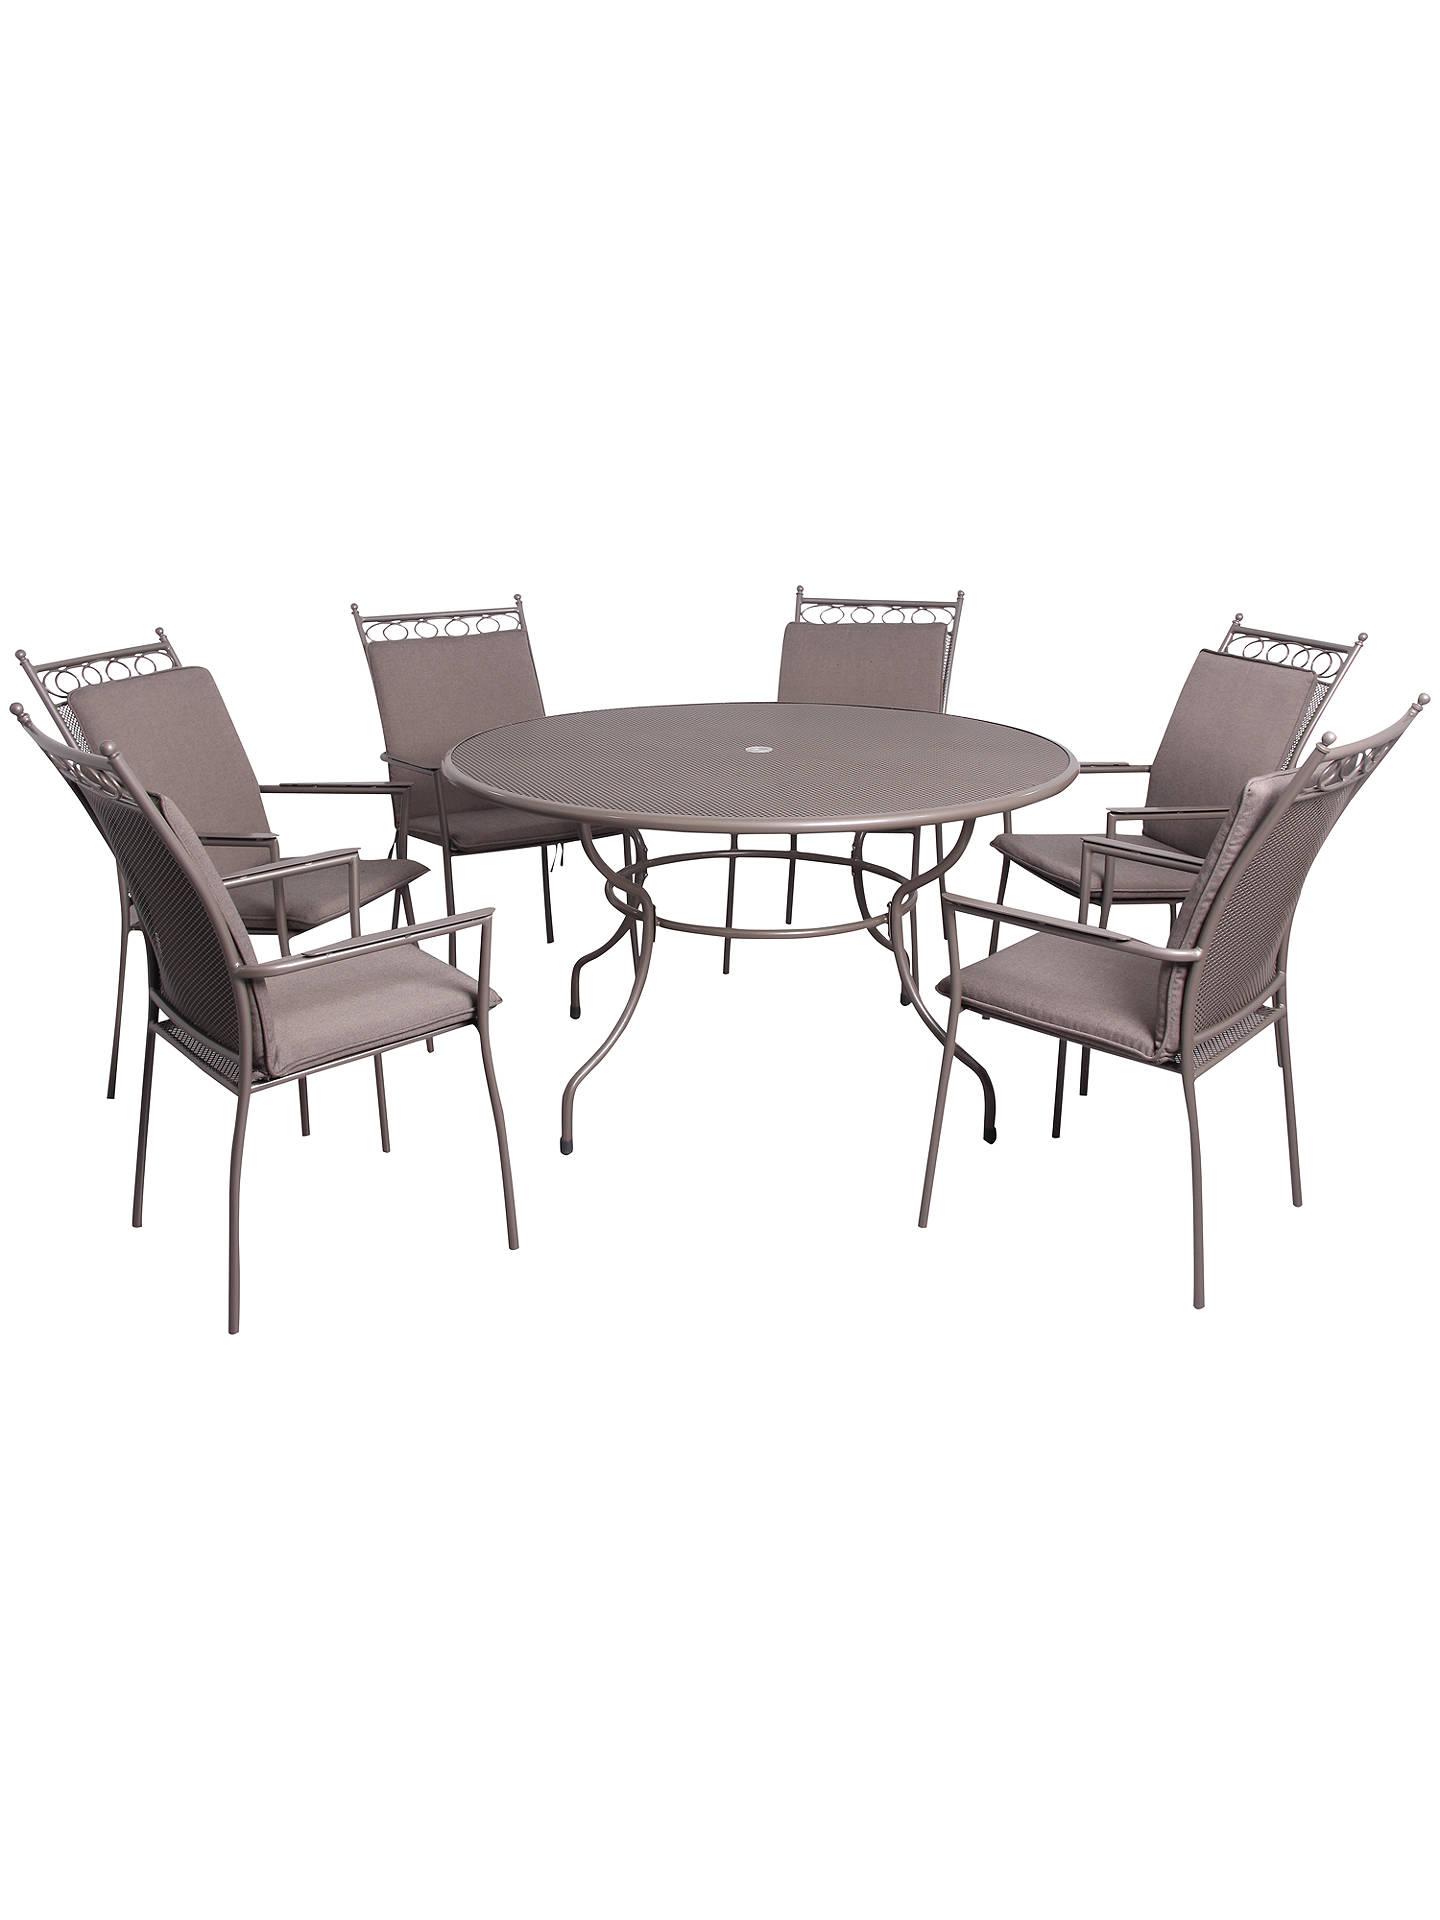 Lg Outdoor Richmond 6 Seater Highback Dining Set Online At Johnlewis